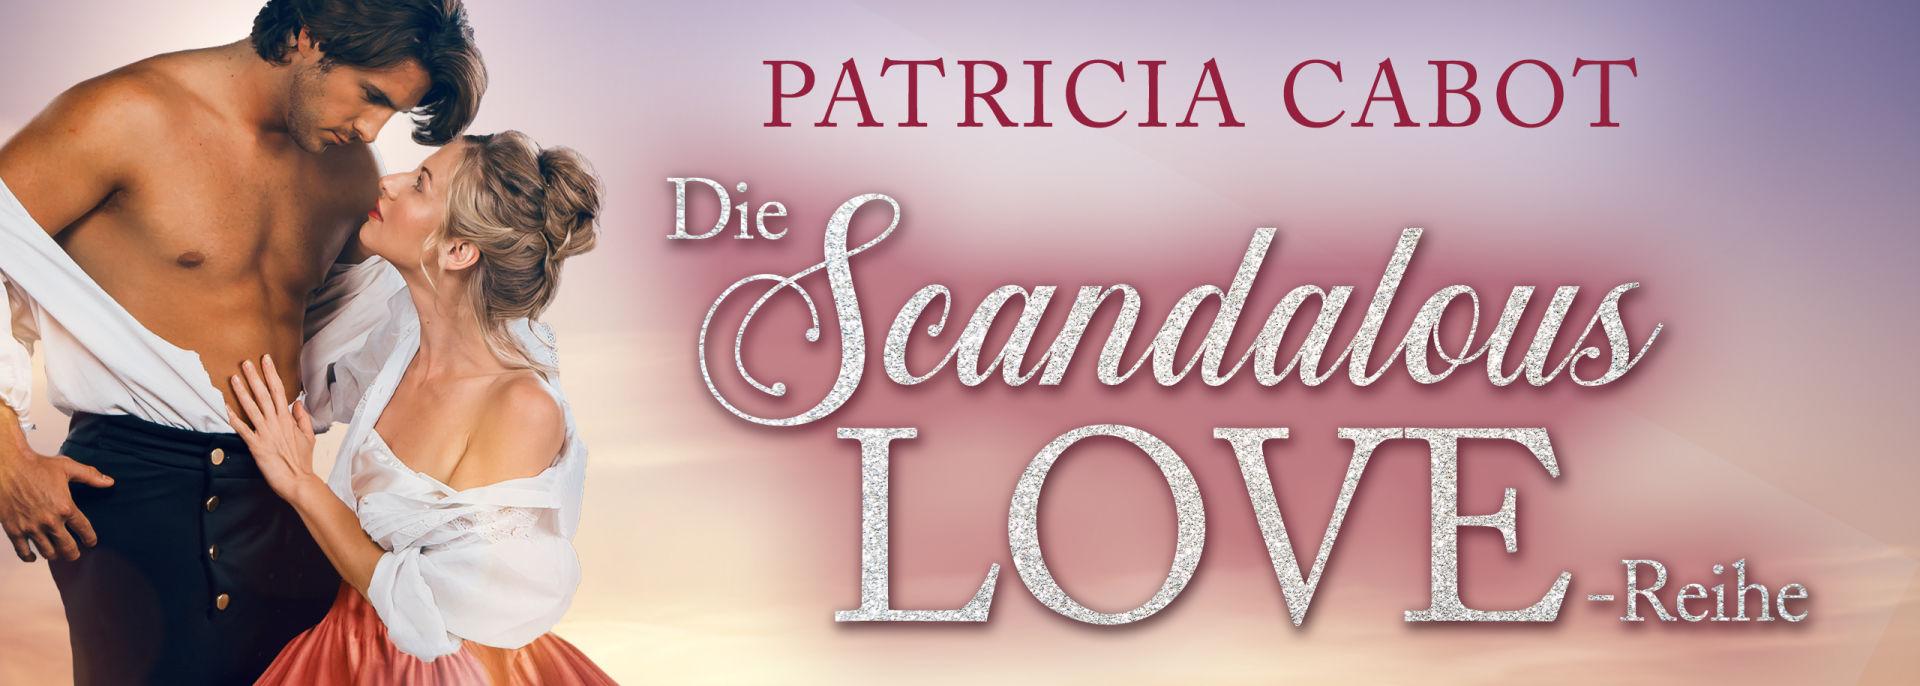 Scandalous Love-Reihe Serienbanner